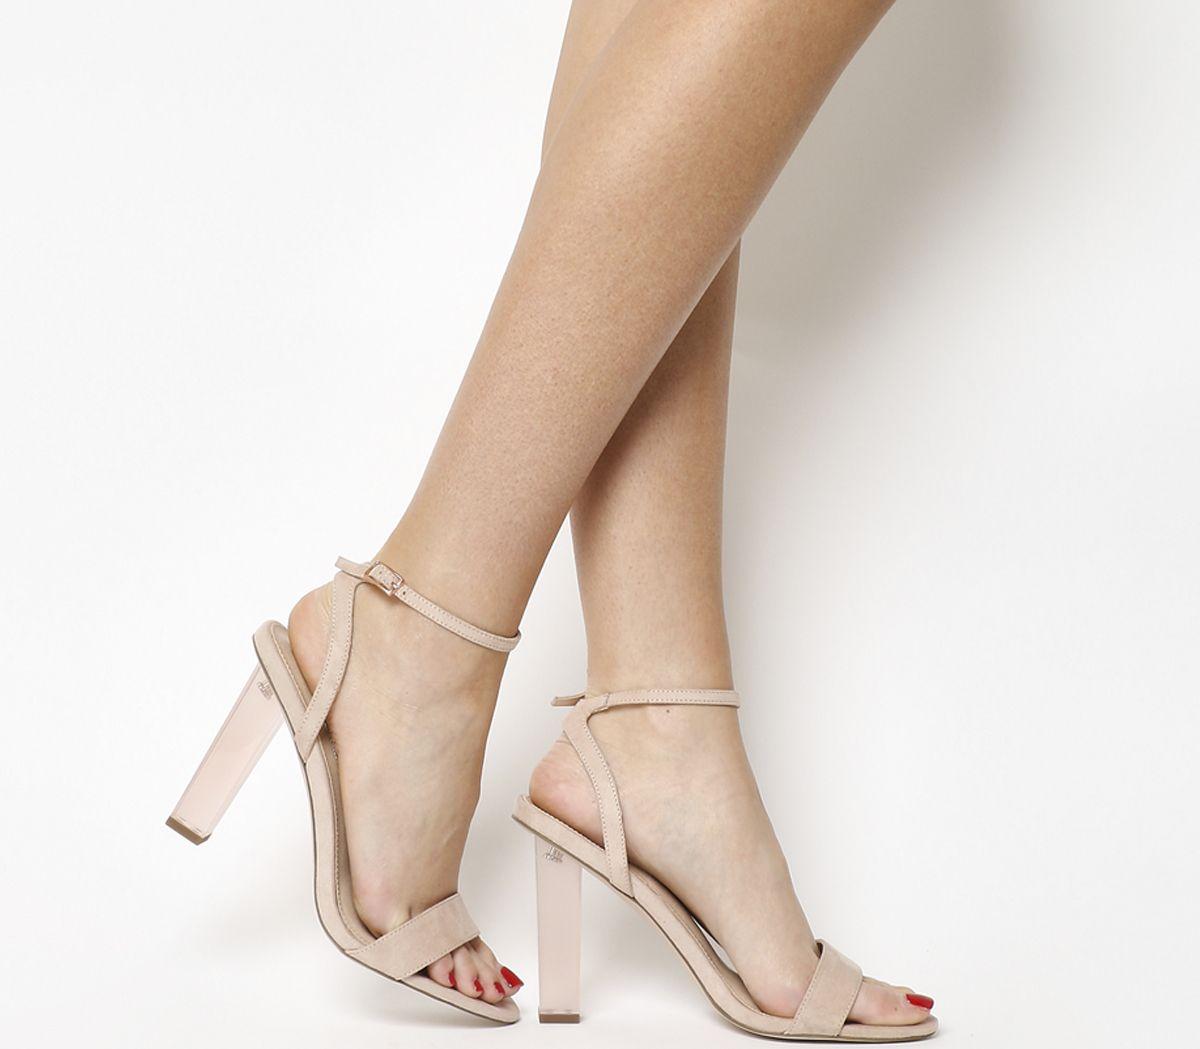 dfad3ade616 Office Hover Transparent Heel Sandals Nude - High Heels